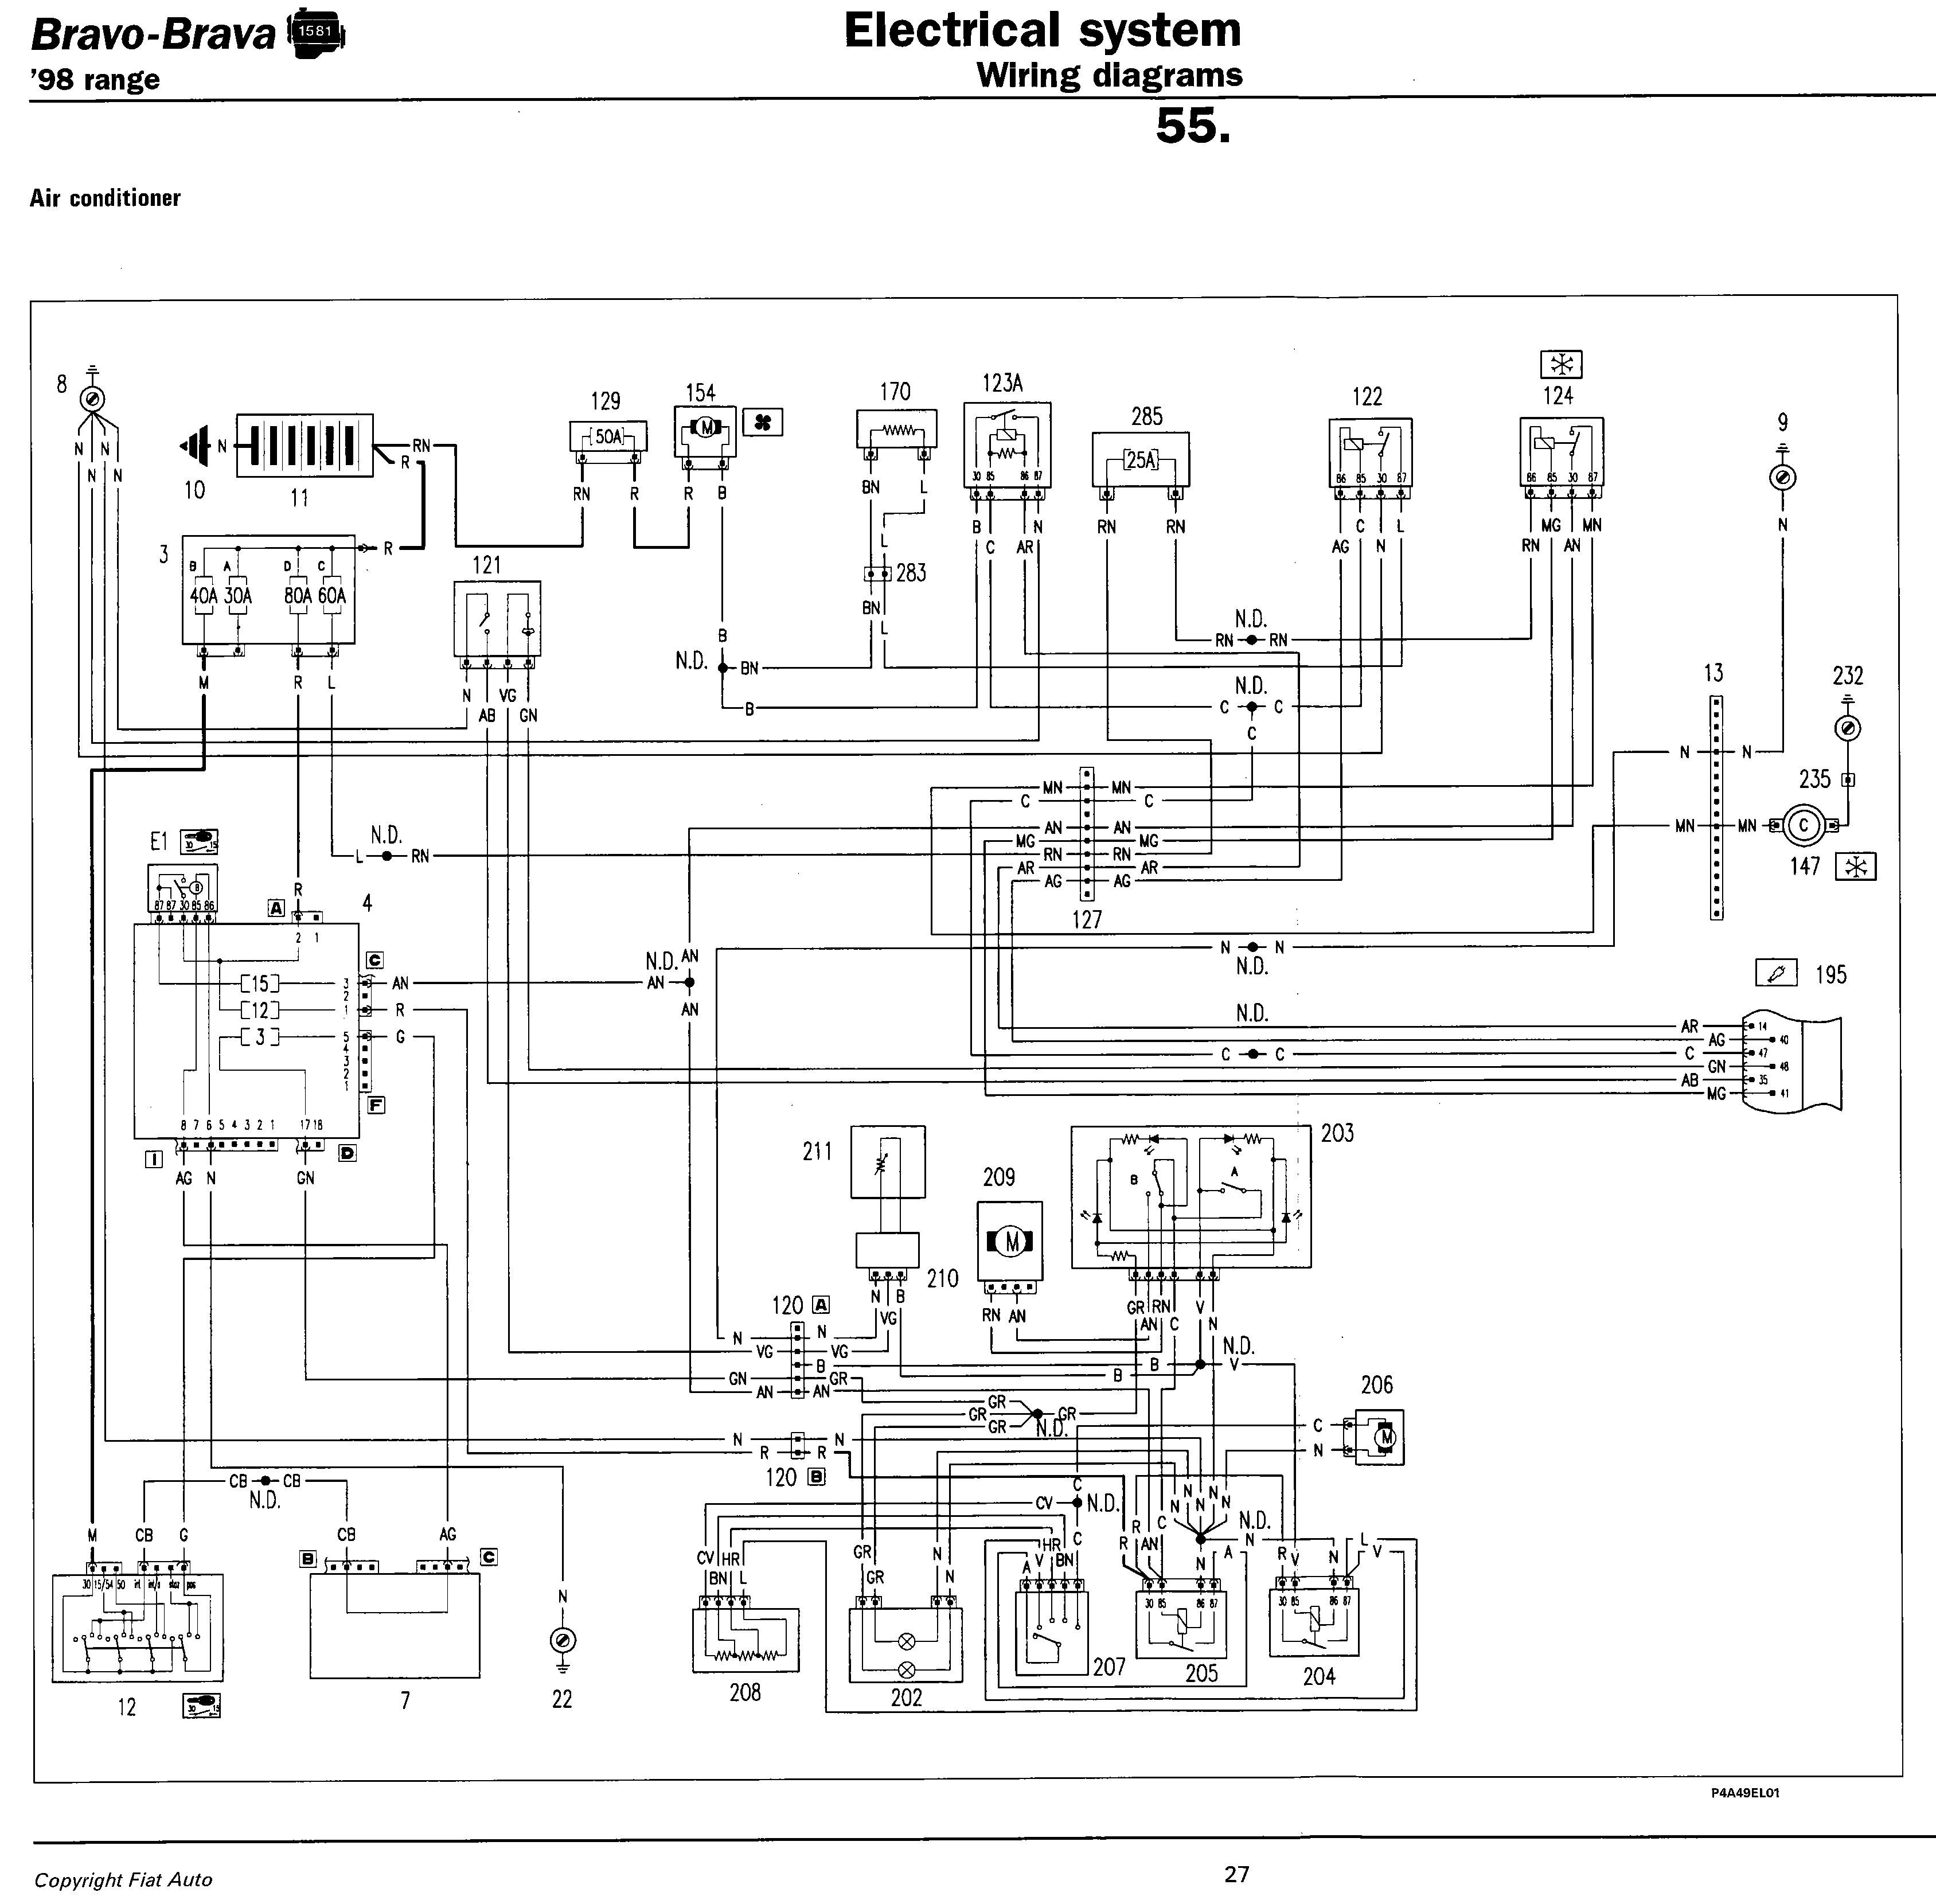 cmp lab diagram 2 way light switch wiring uk bomag bmp 851 free for you diagrams rh 53 bukowski music de space x